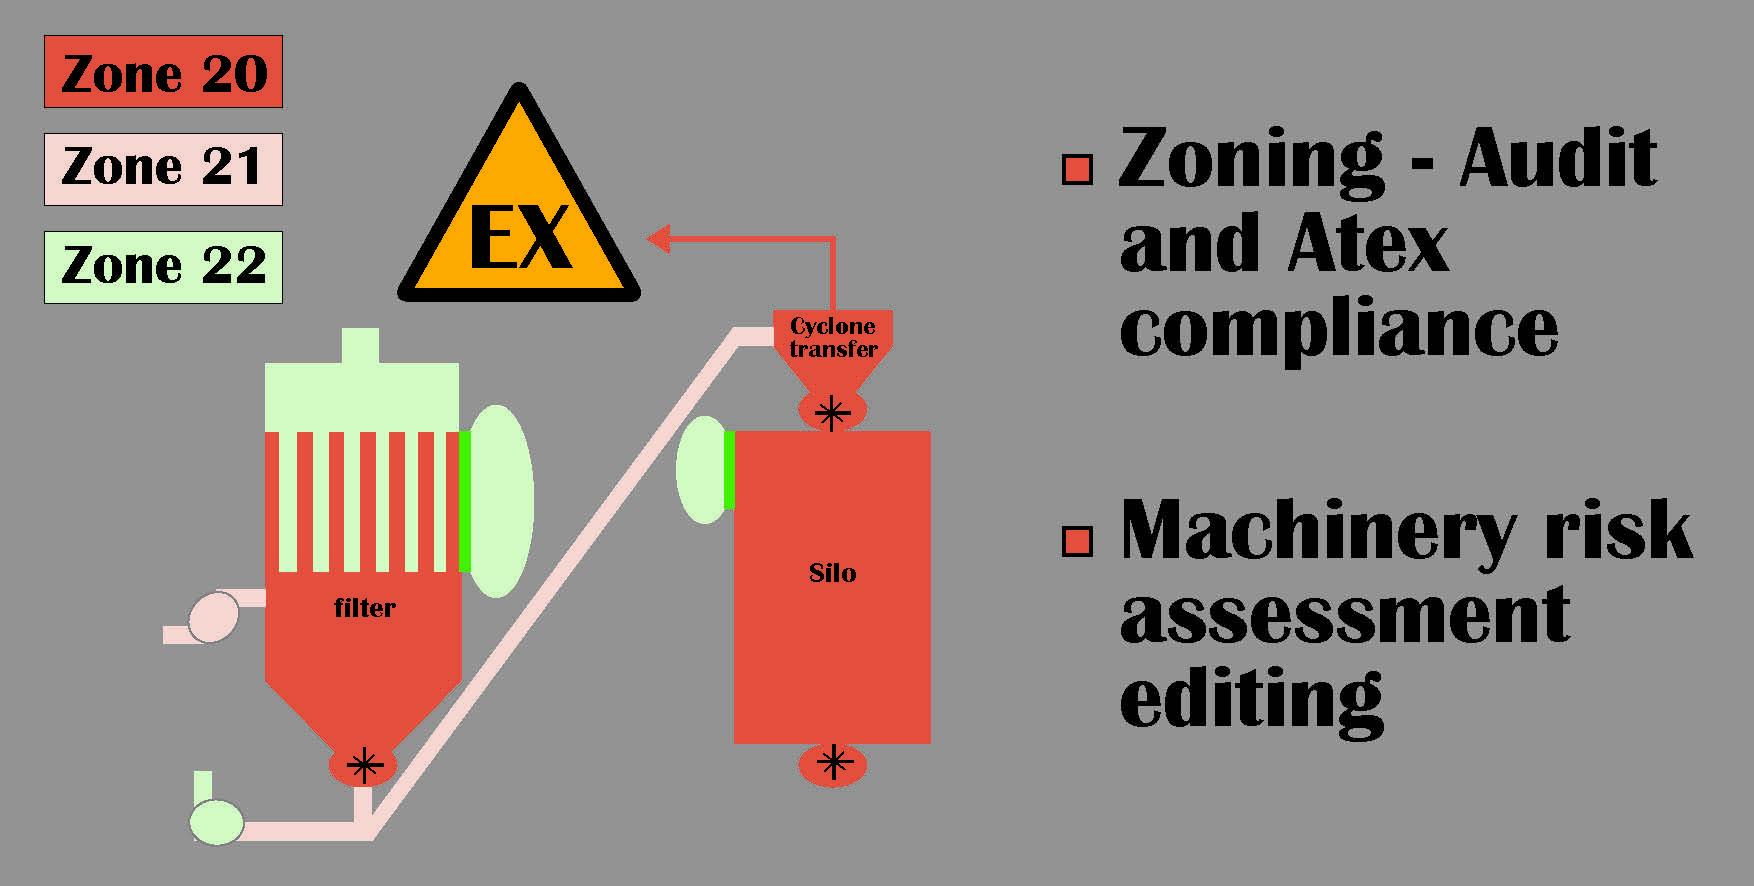 zoning audit atex compliance palamatic process